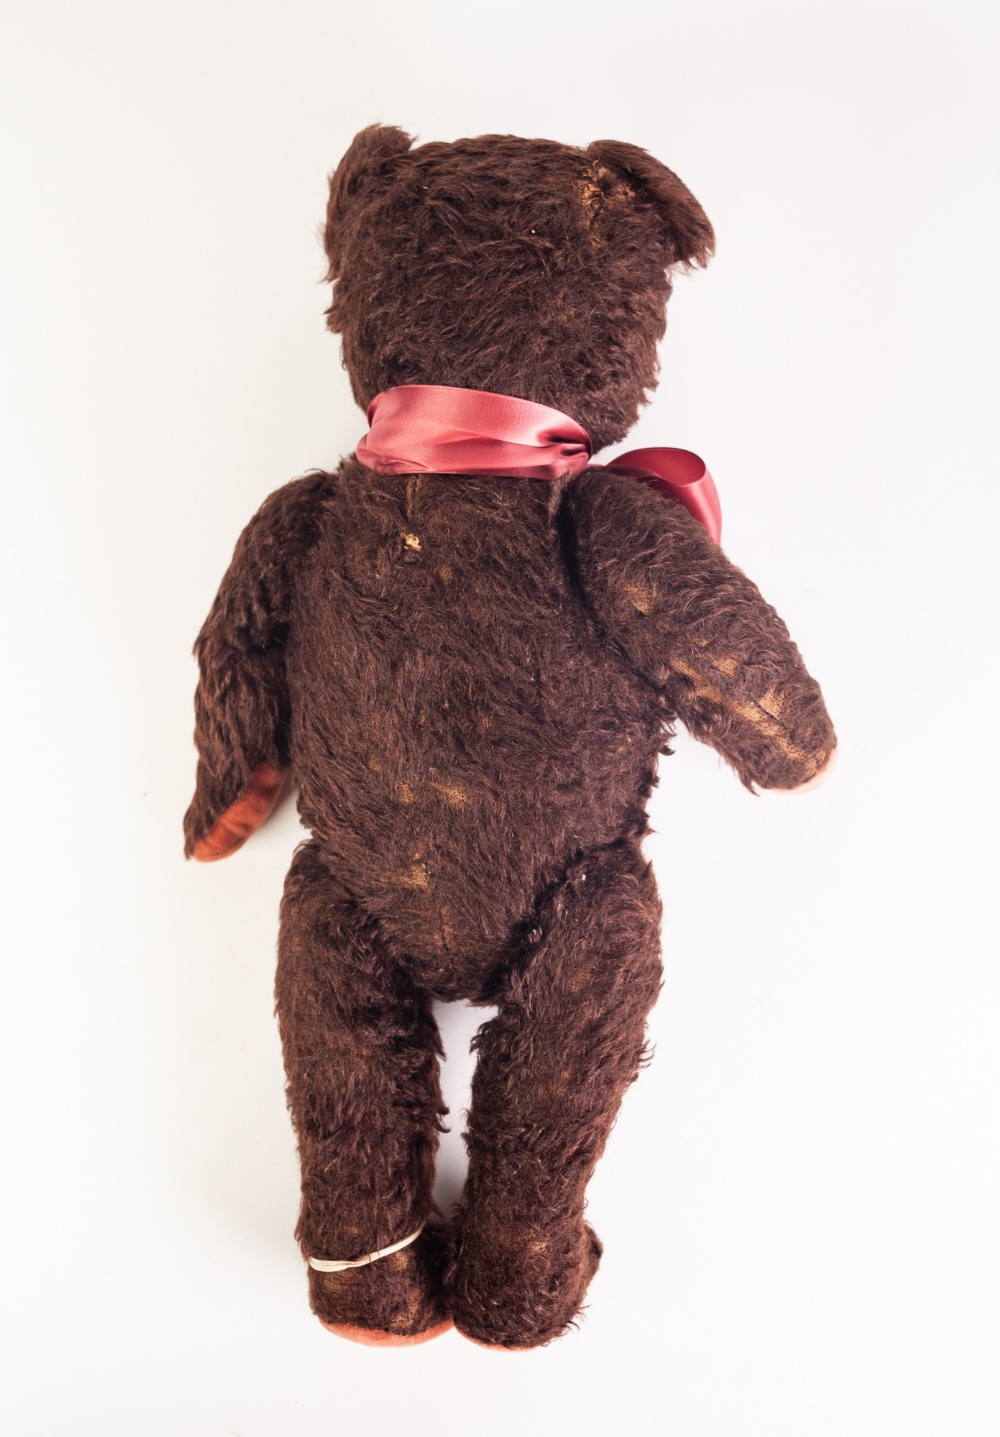 Lot 317 - AN EARLY TWENTIETH CENTURY WOOD STRAW FILLED CINNAMON PLUSH TEDDY BEAR, with in-operative growler,